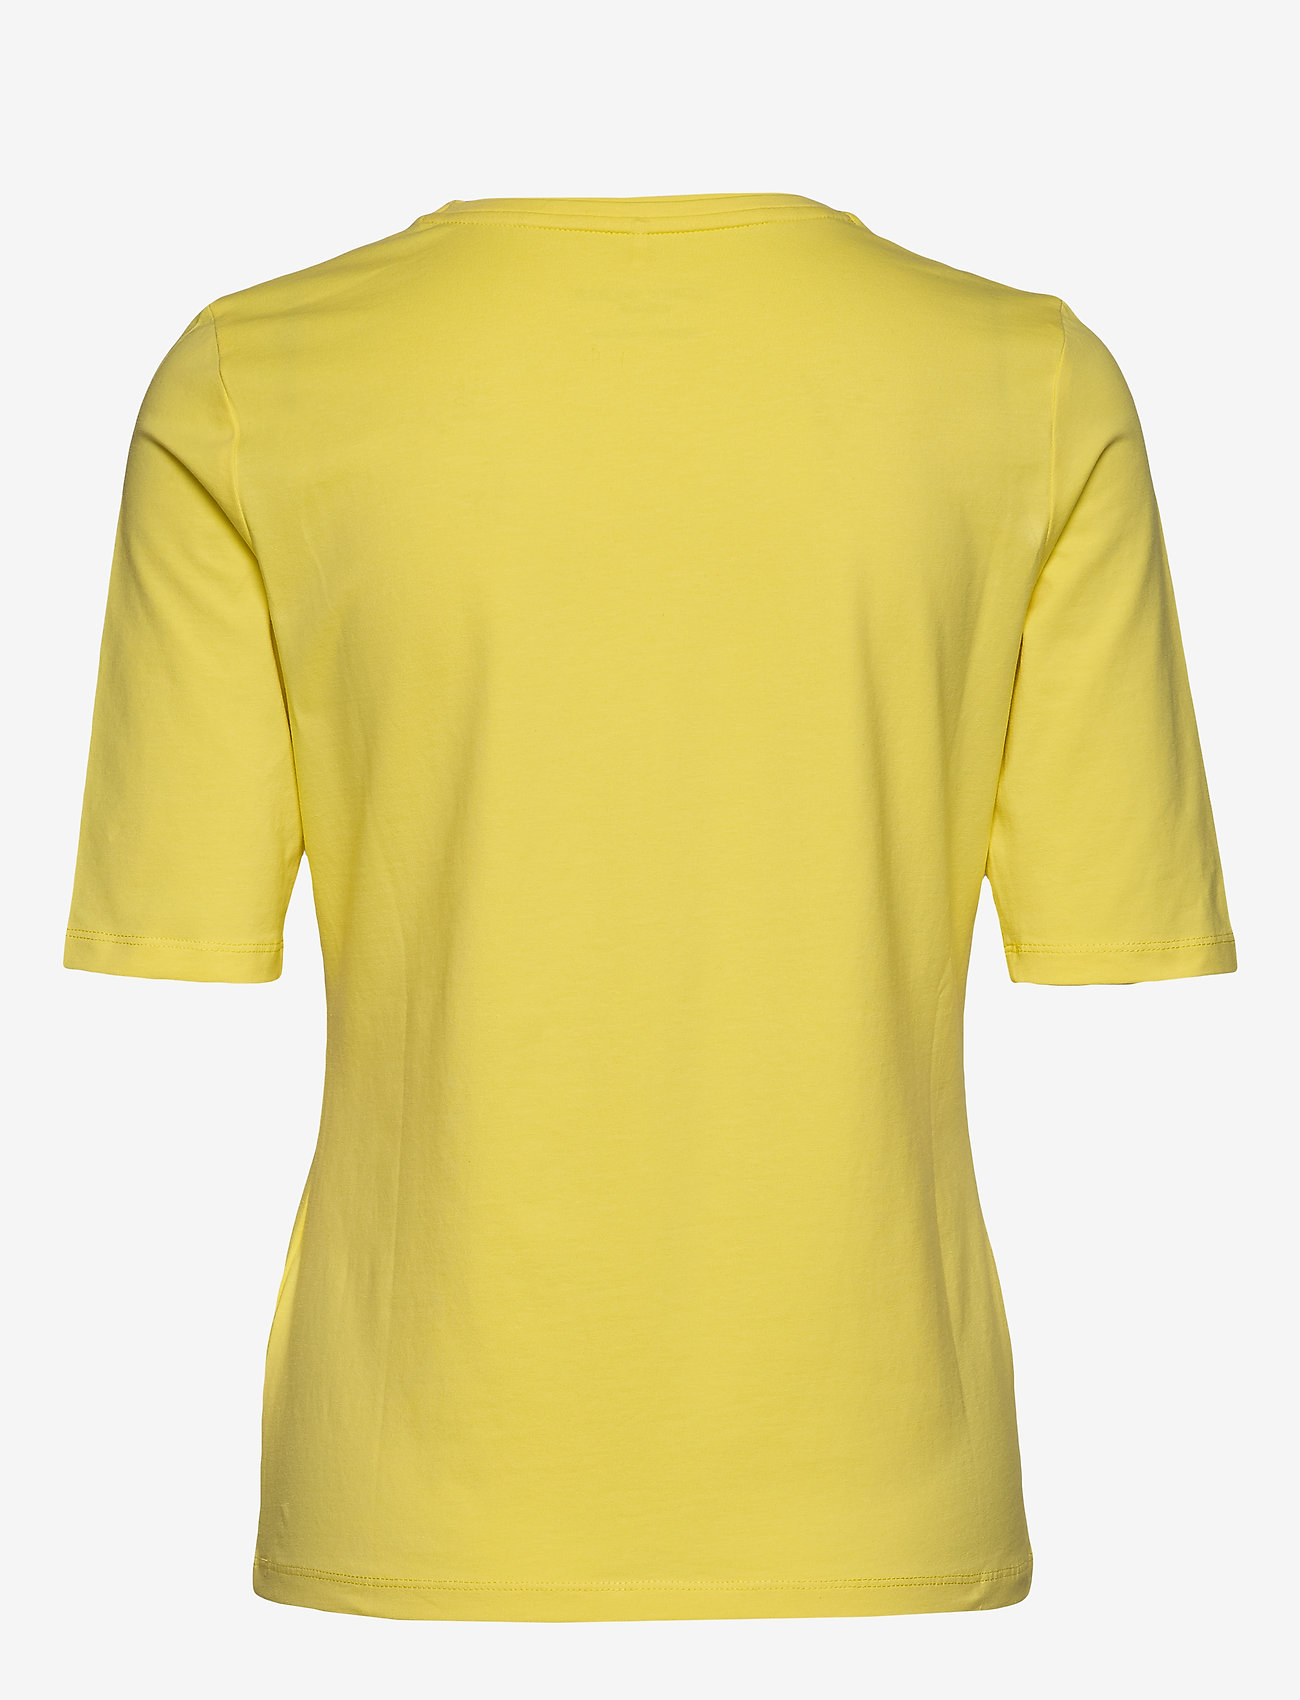 T-shirt 3/4-sleeve R (Citrus) (259.35 kr) - Gerry Weber Edition